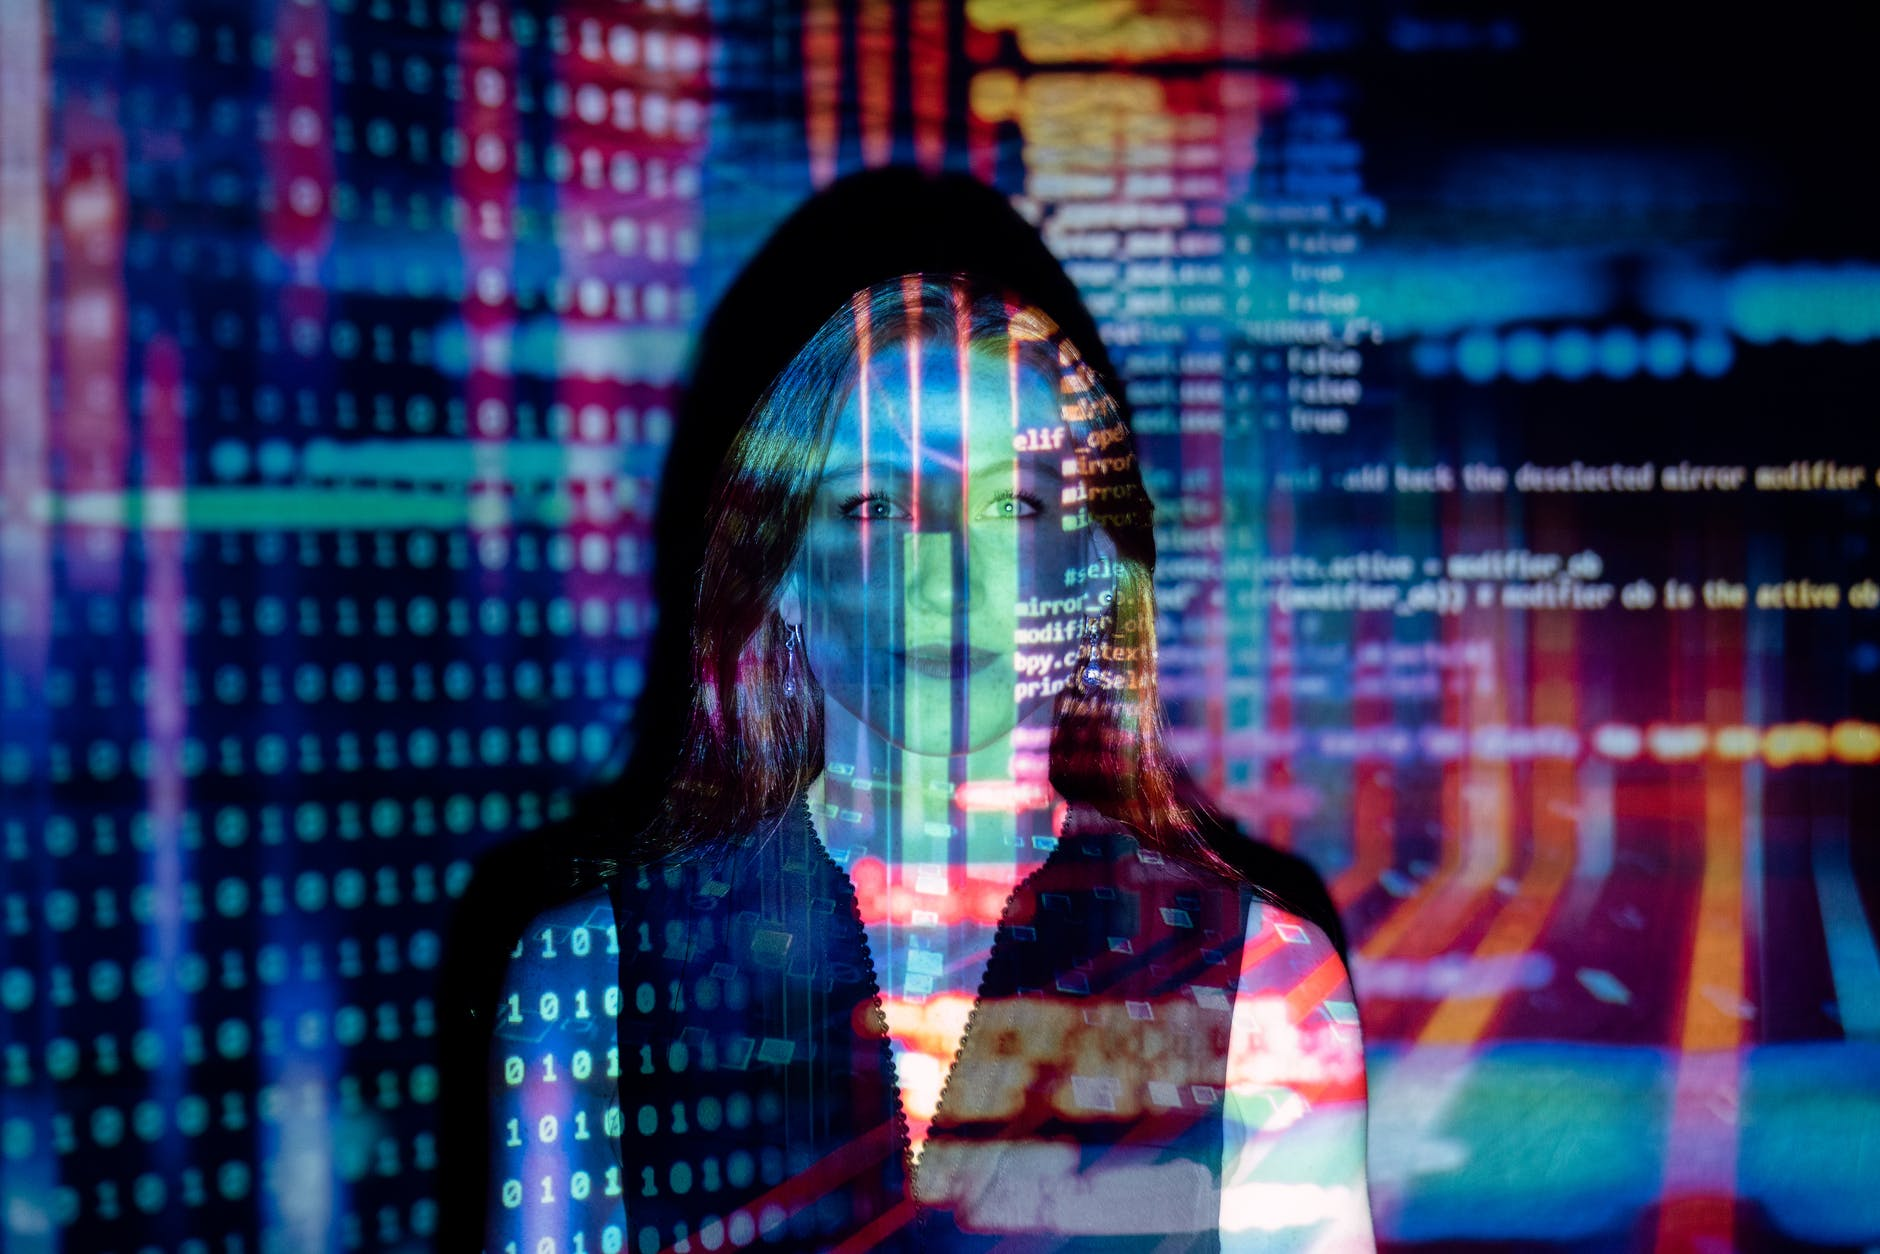 4 Compliance Concerns for a Data Center Management Solution